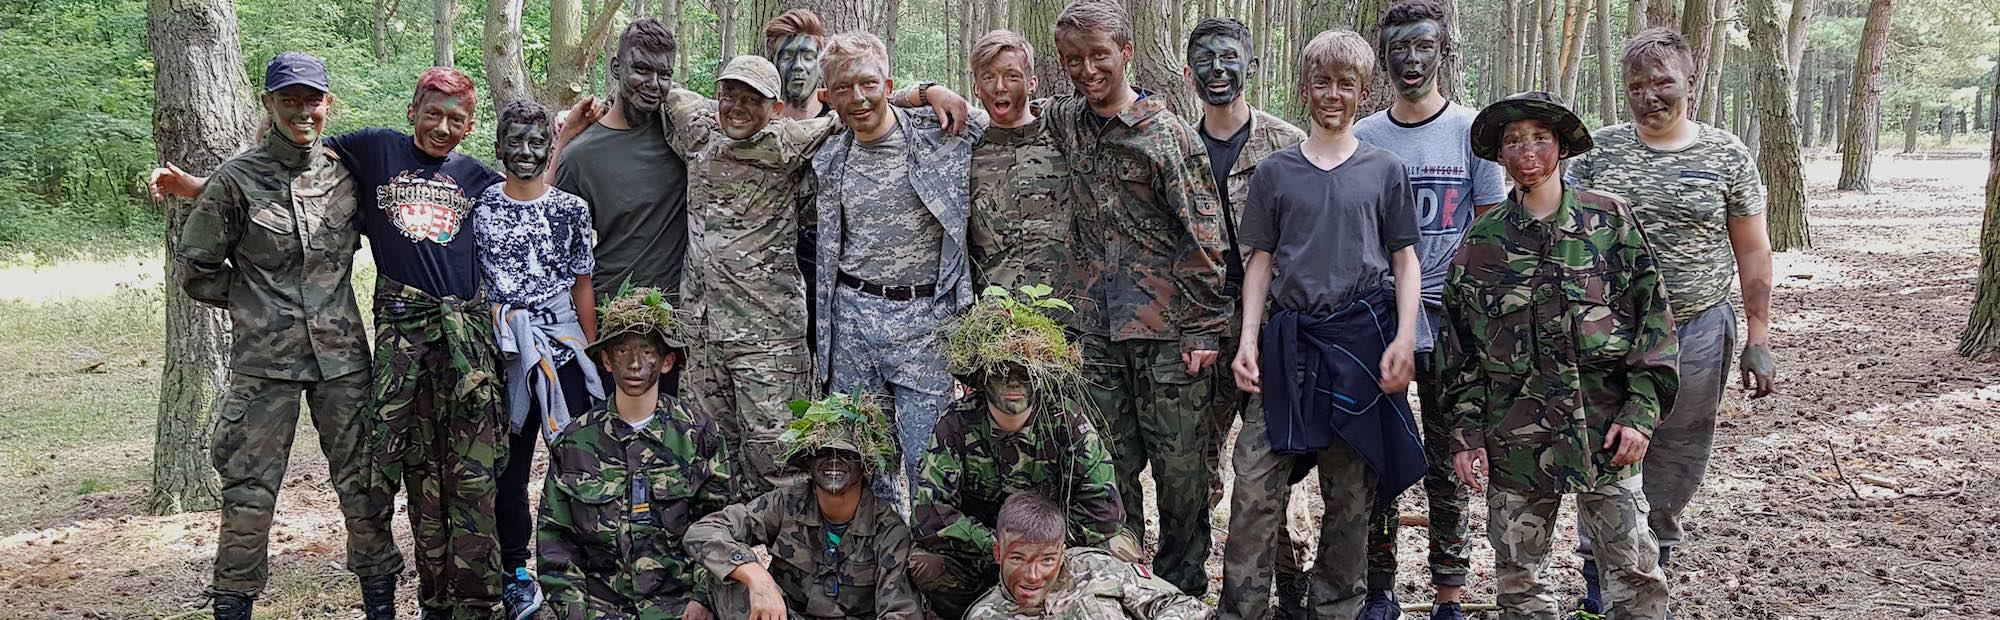 obóz militarny 2019